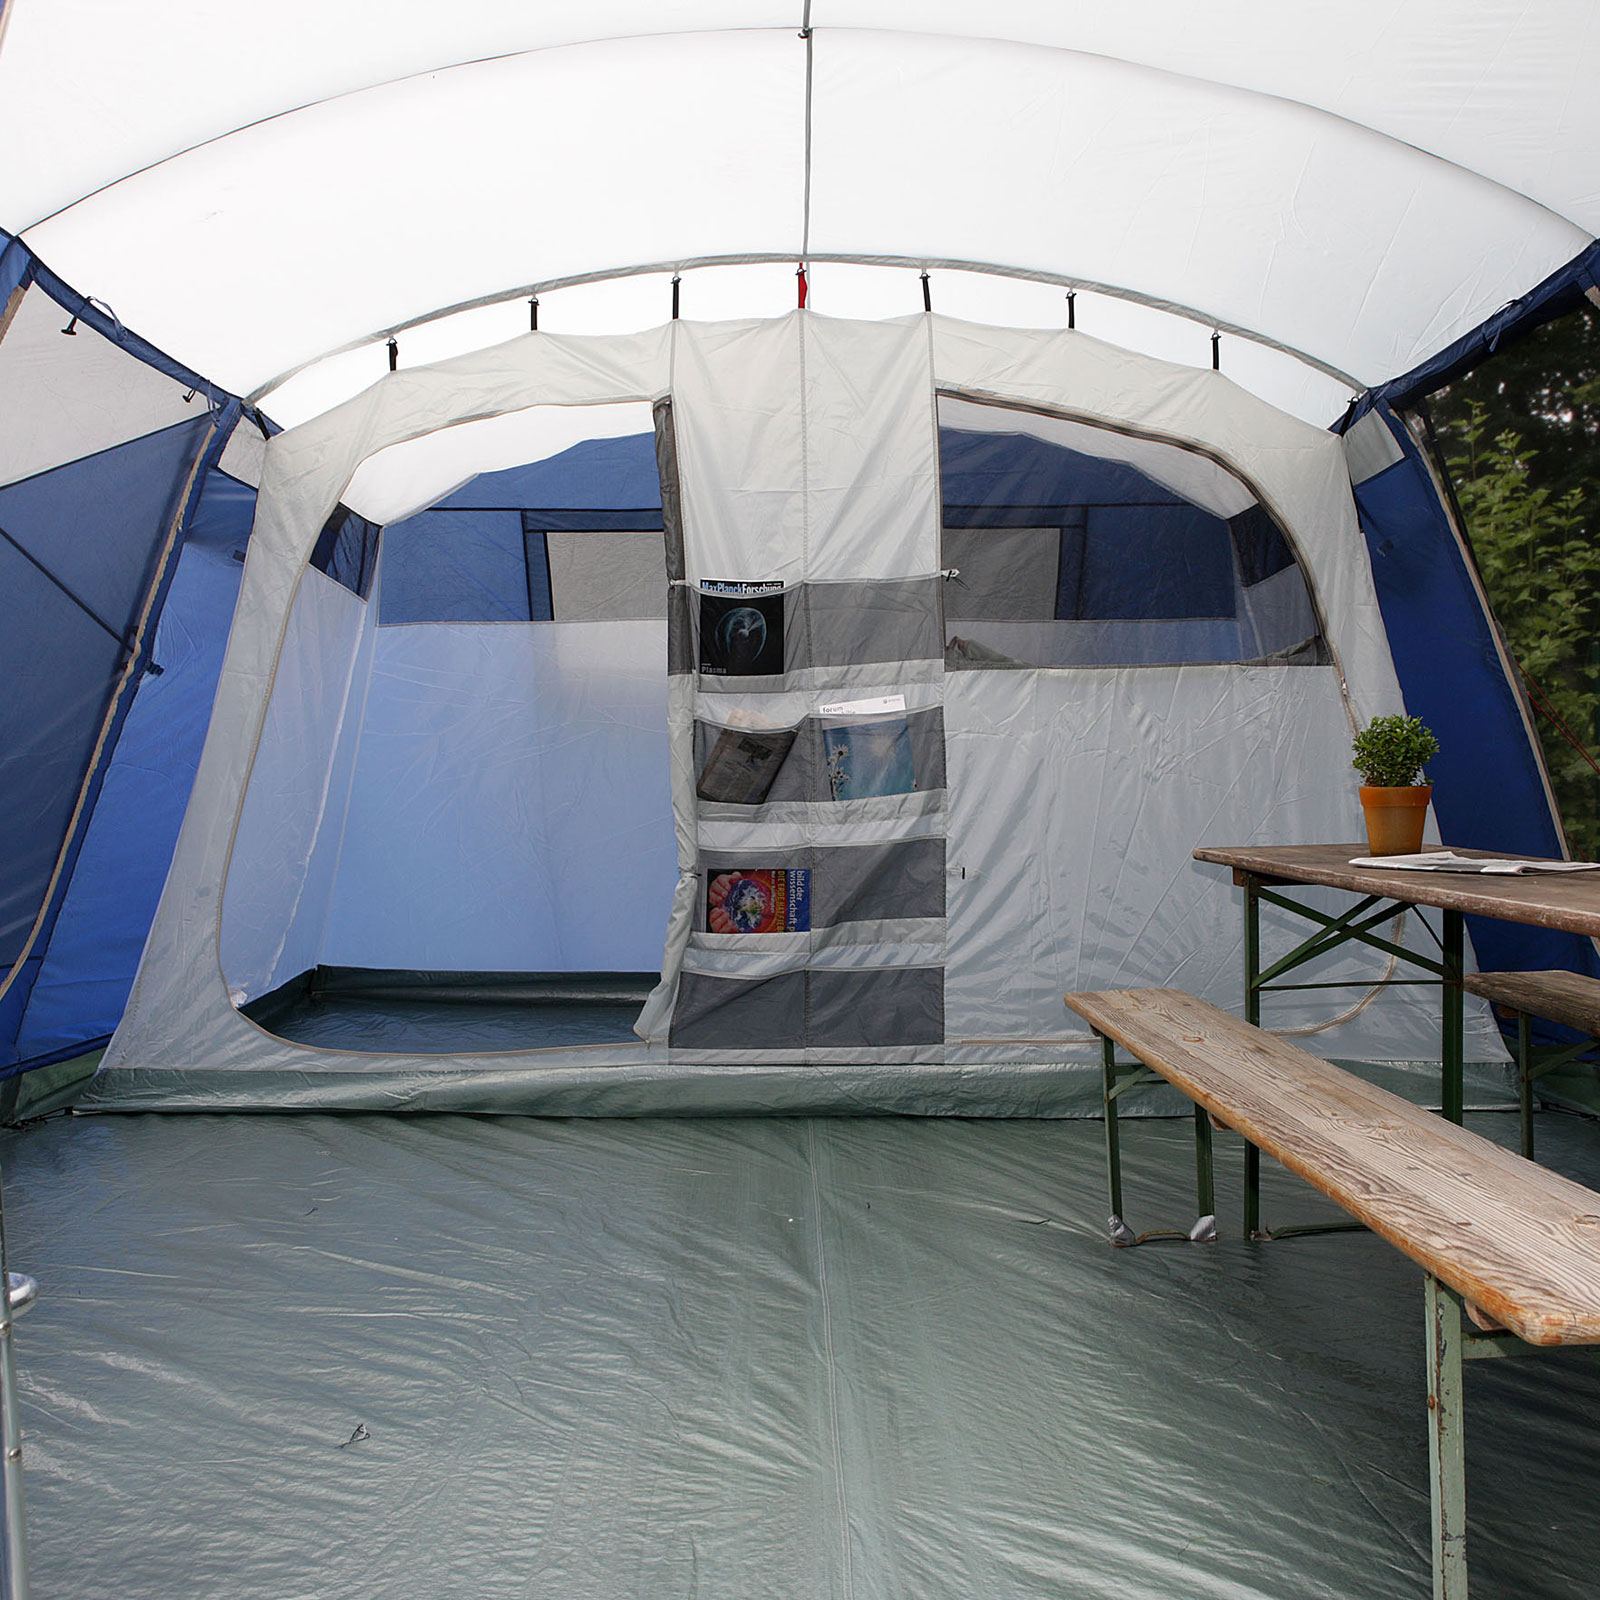 skandika milano 6 pers tente camping familiale 580x410 cm neuf eur 399 00 picclick fr. Black Bedroom Furniture Sets. Home Design Ideas